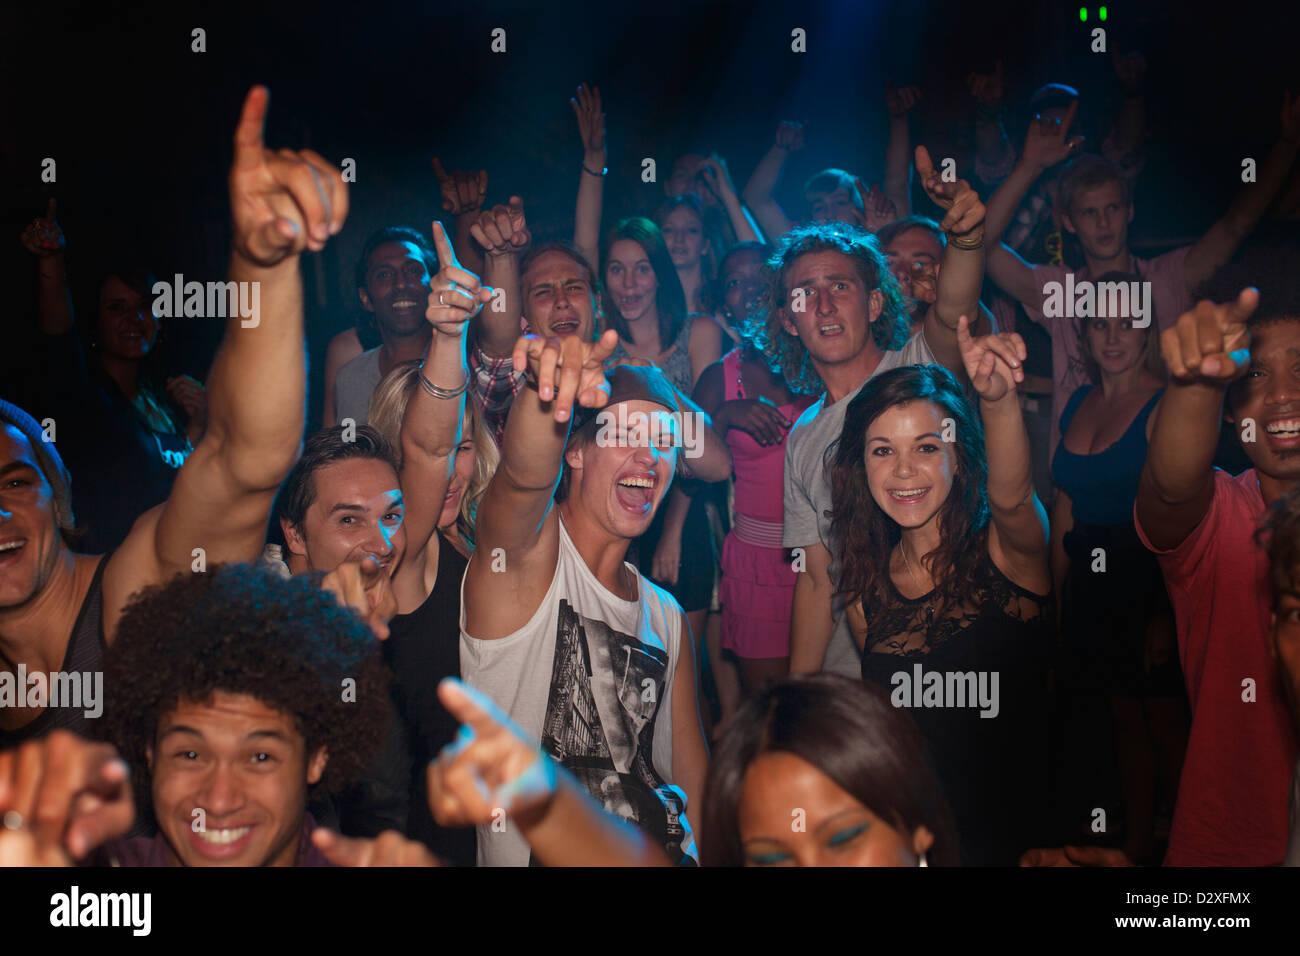 Begeistertes Publikum jubeln beim Konzert Stockbild